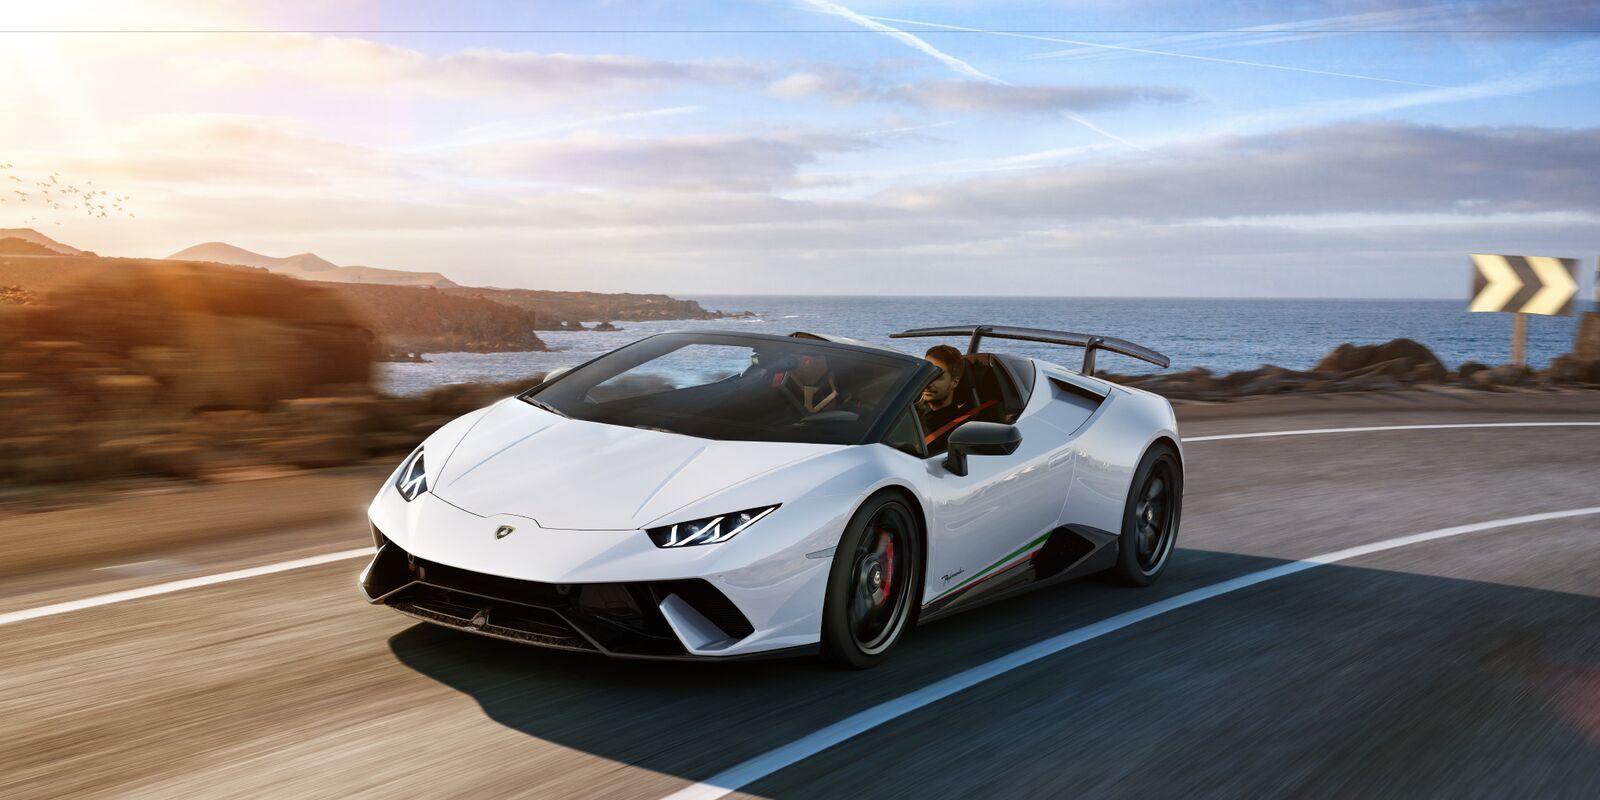 The 2019 Lamborghini Huracan Performante Spyder Pictures